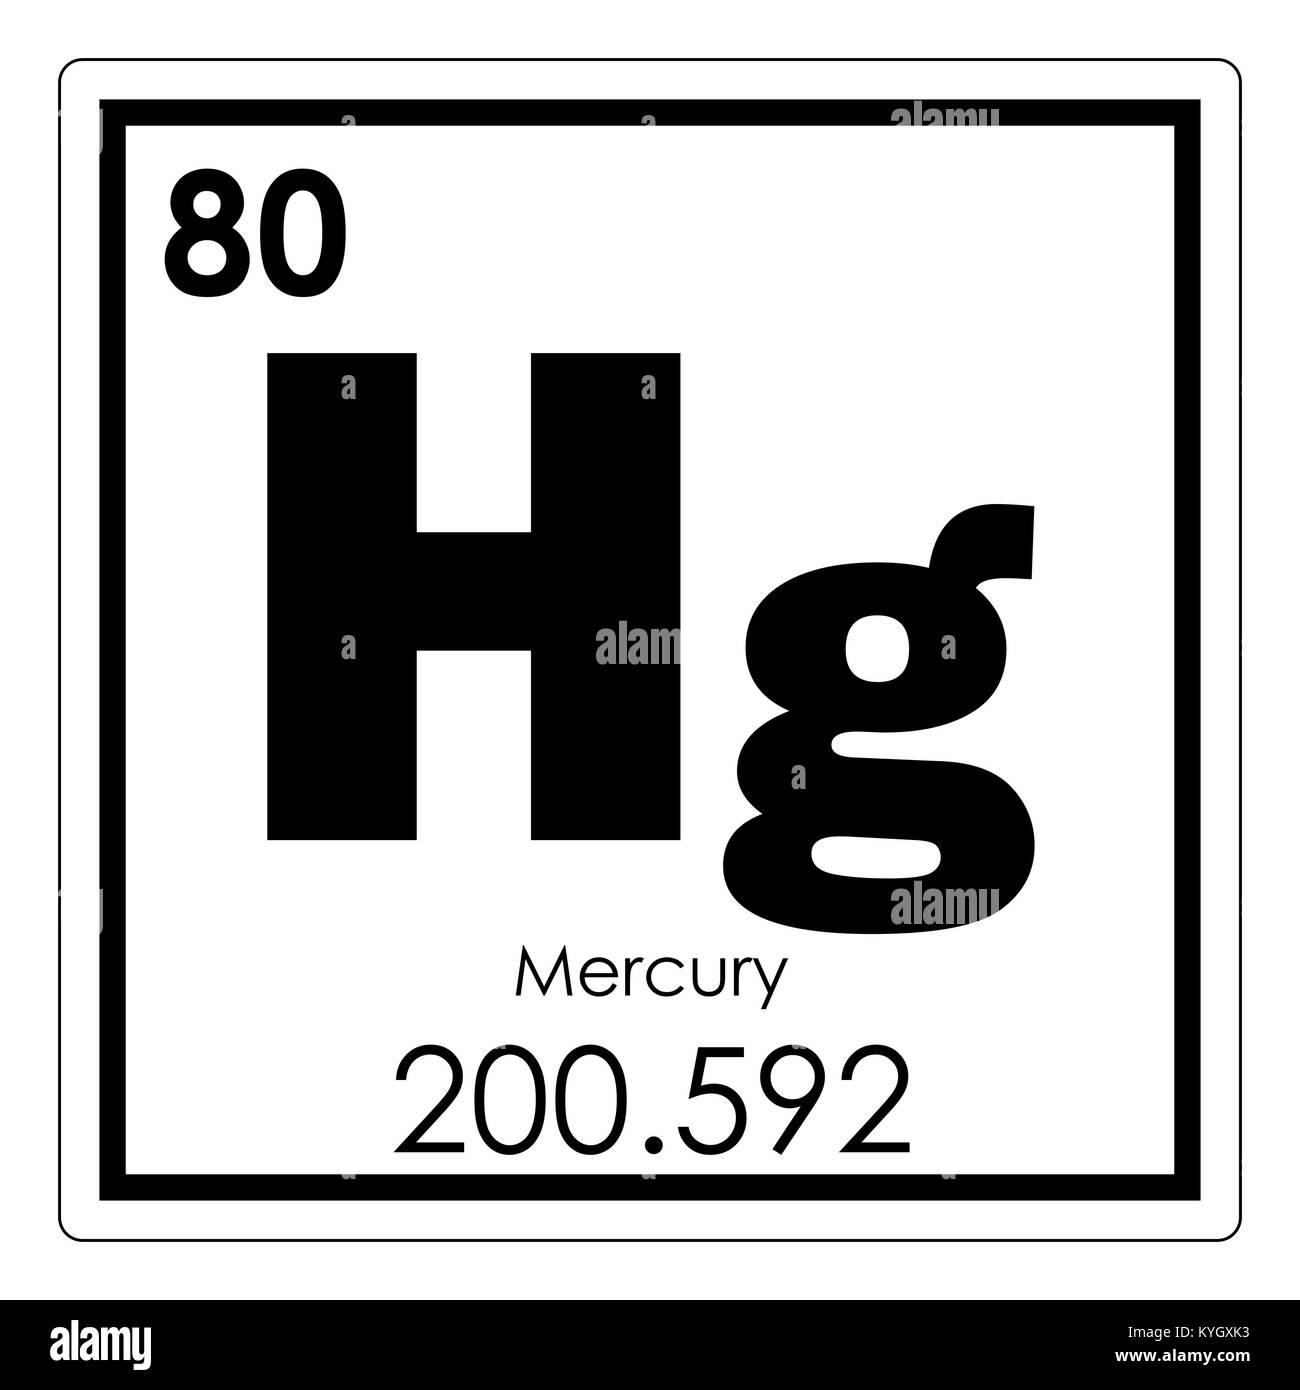 Mercury chemical element periodic table science symbol stock photo mercury chemical element periodic table science symbol urtaz Image collections